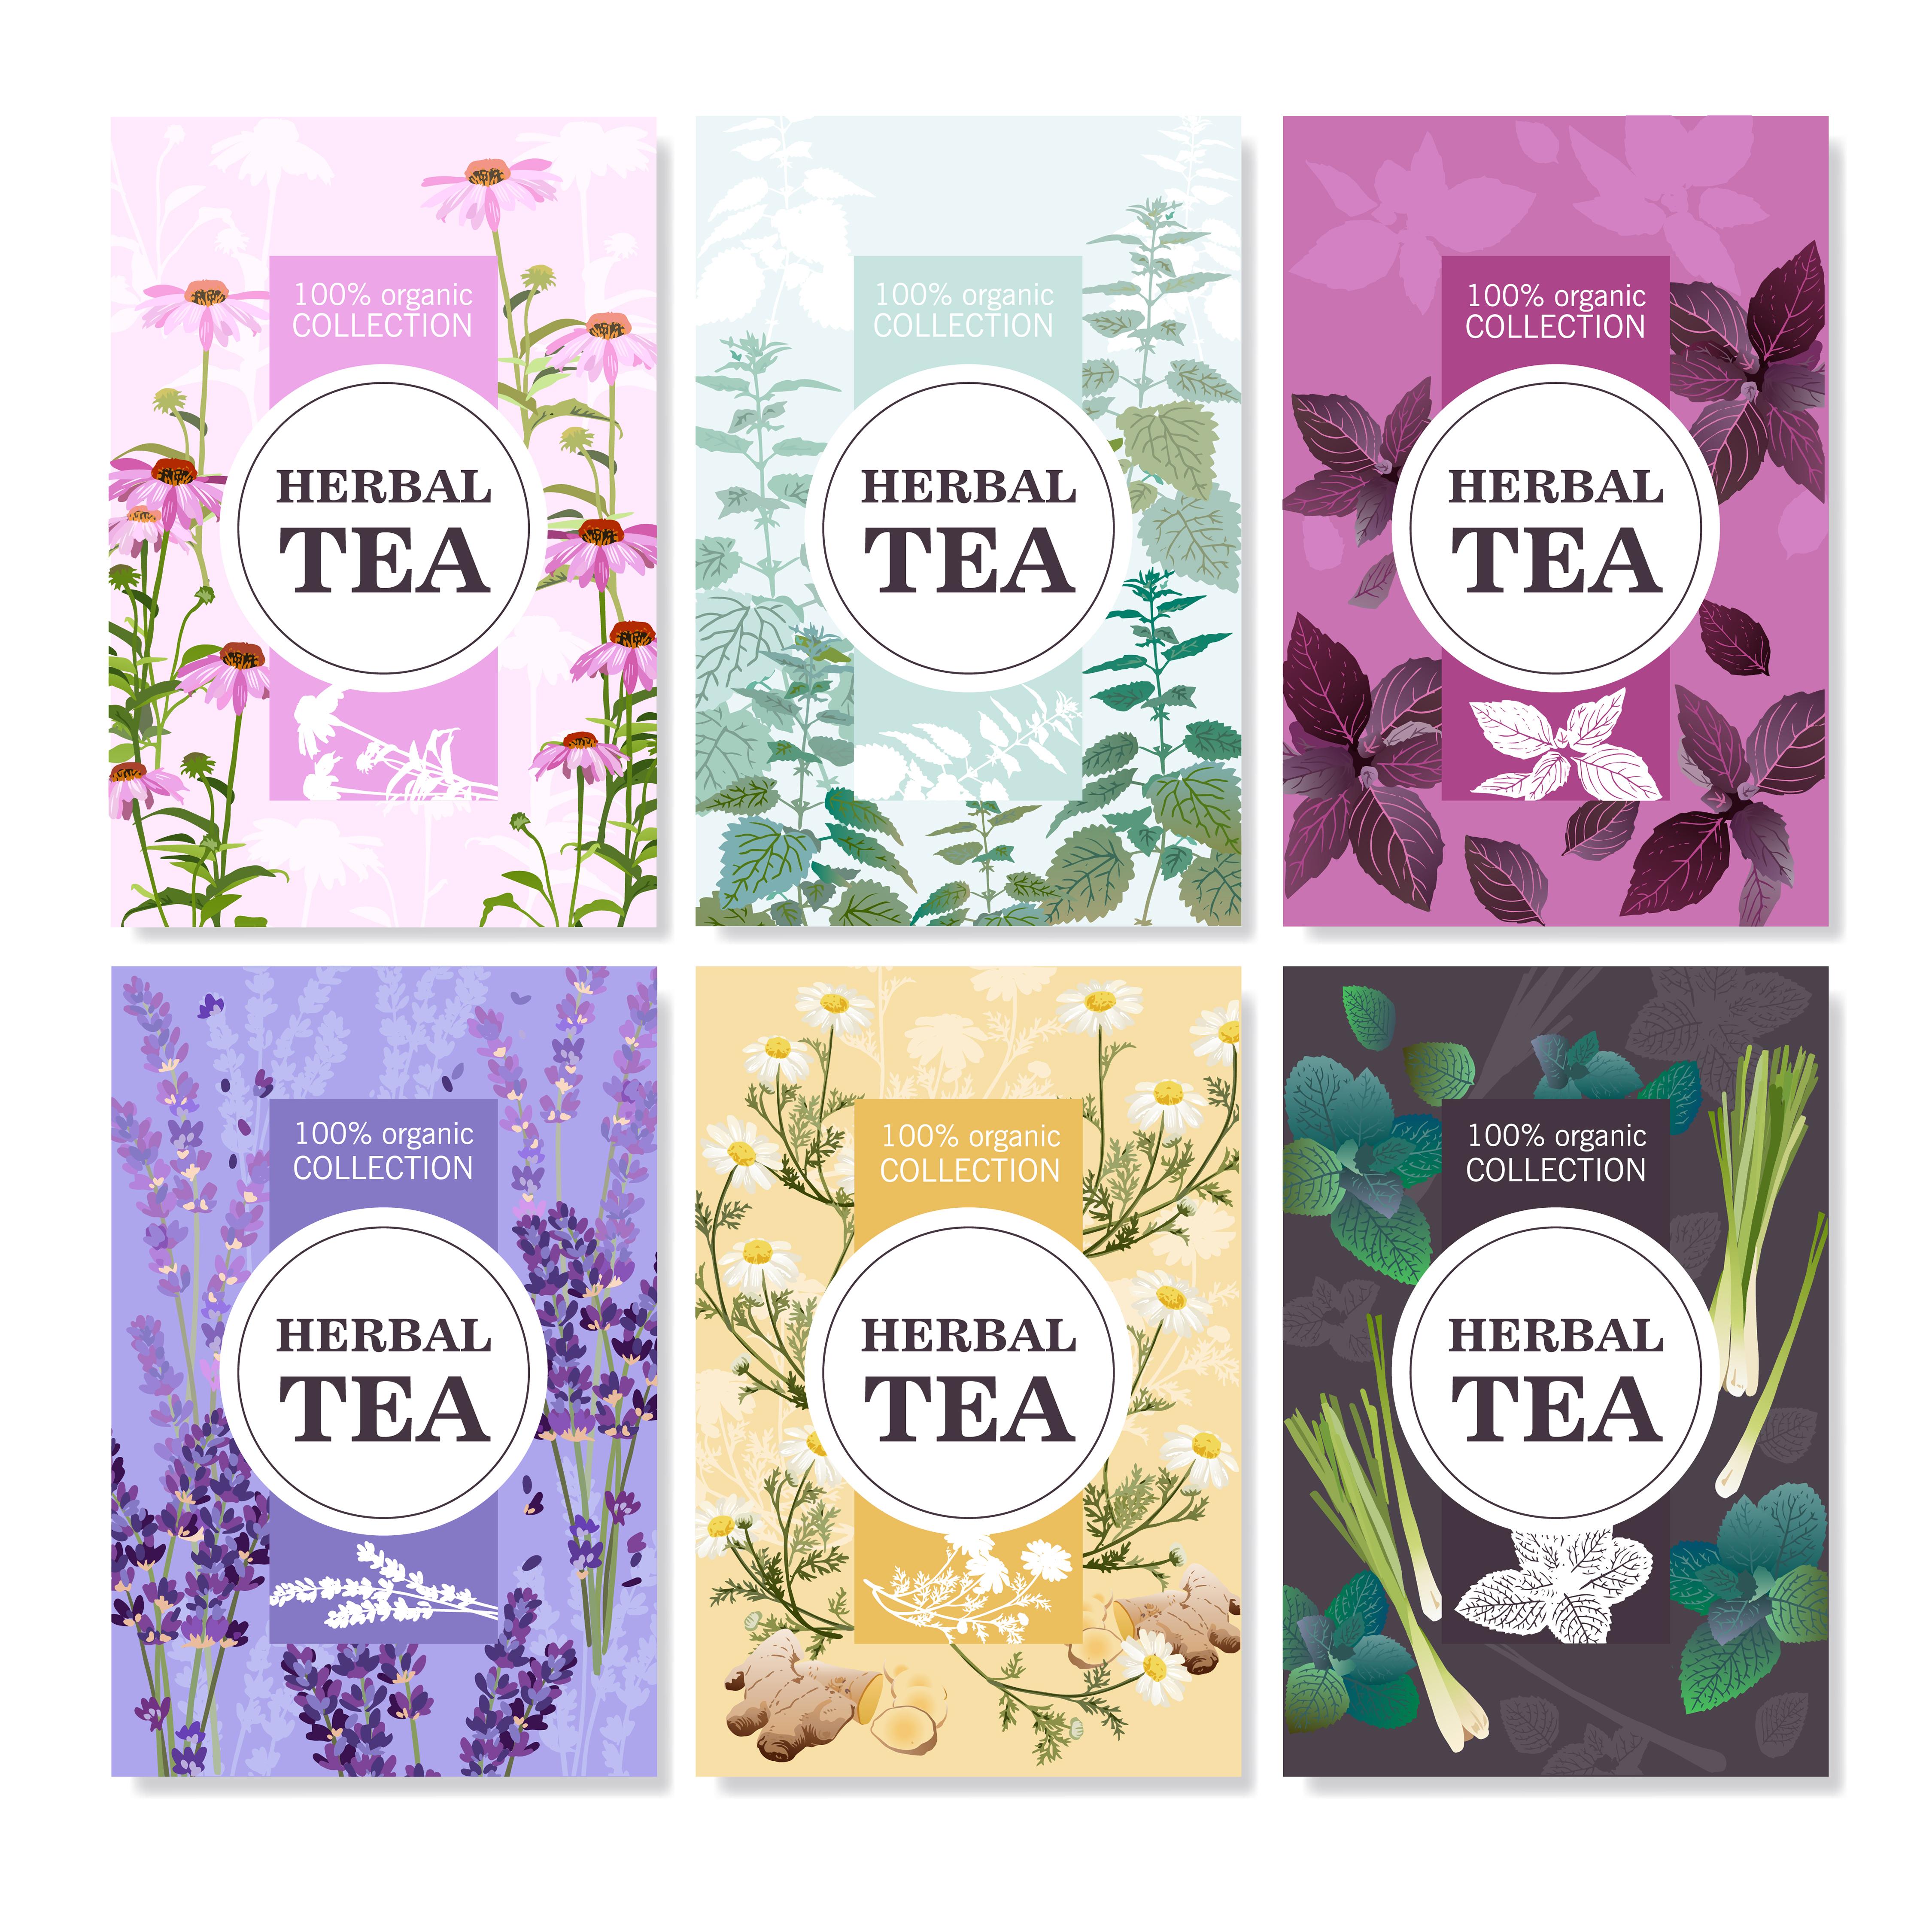 Herbal Tea Colored Banners Set Download Free Vectors Clipart Graphics Vector Art